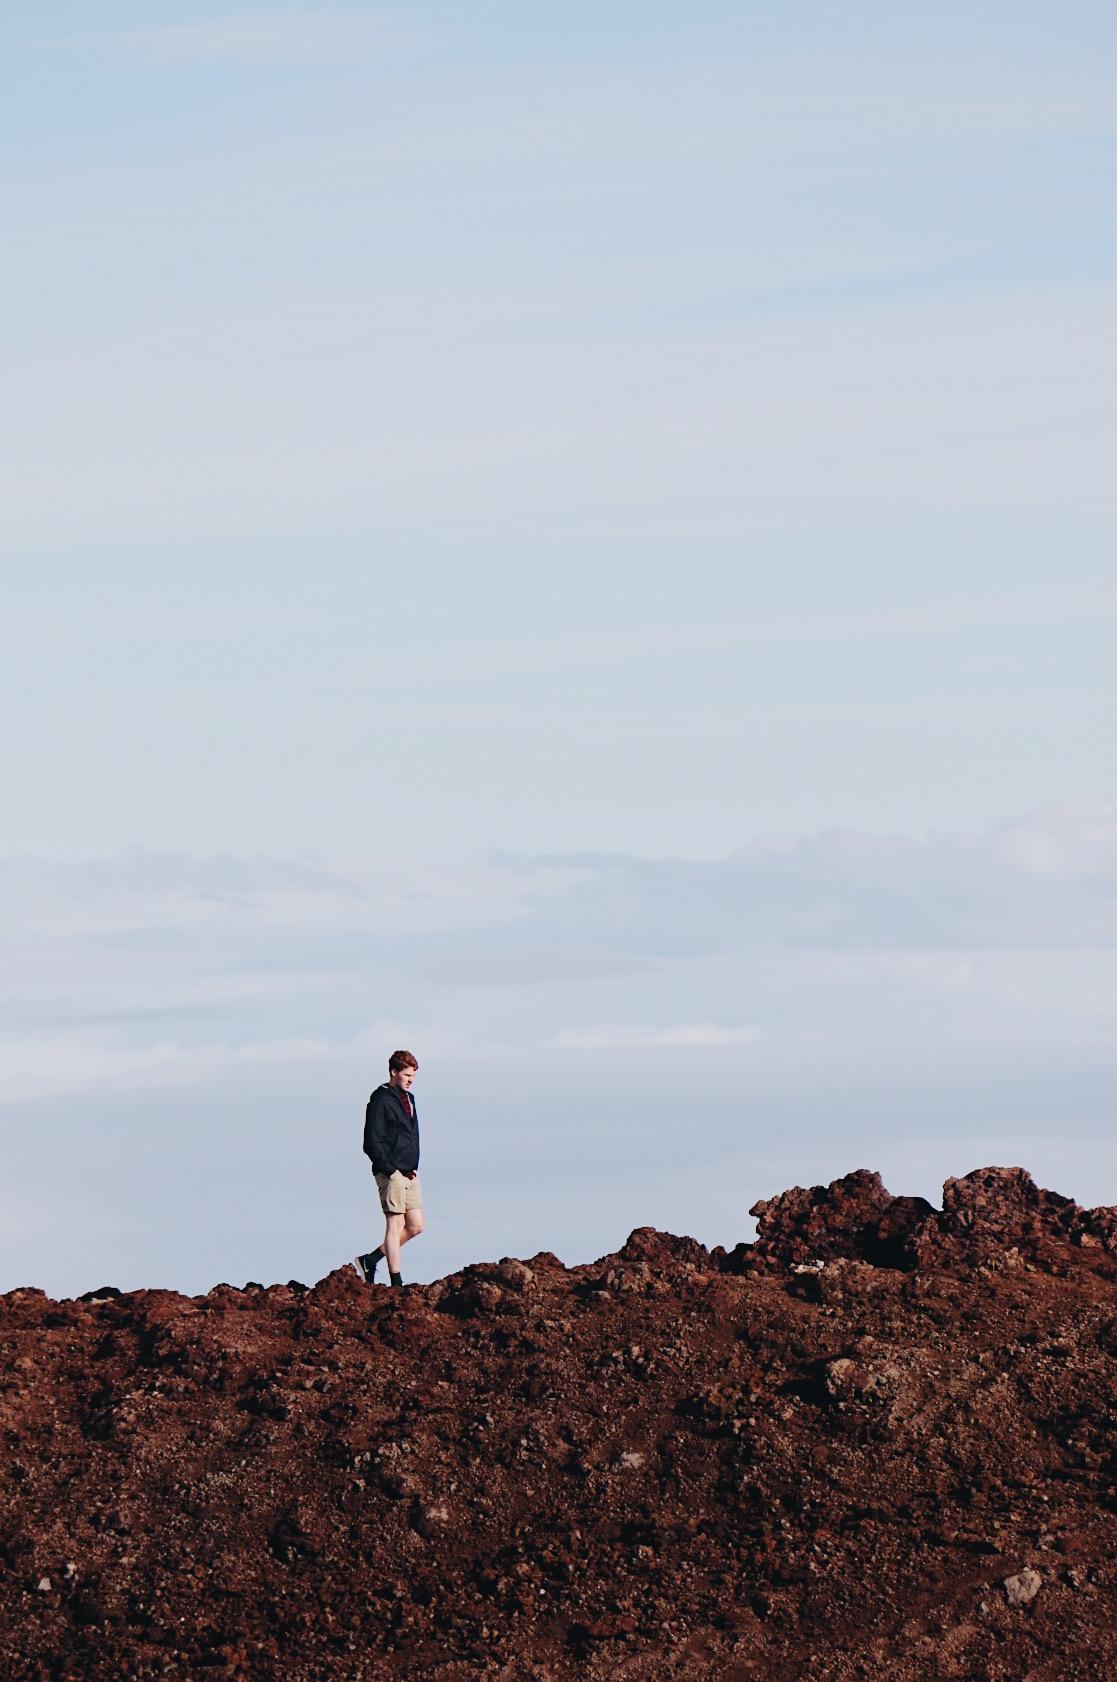 Austin Cody walks along a rocky trail in Haleakalā National Park